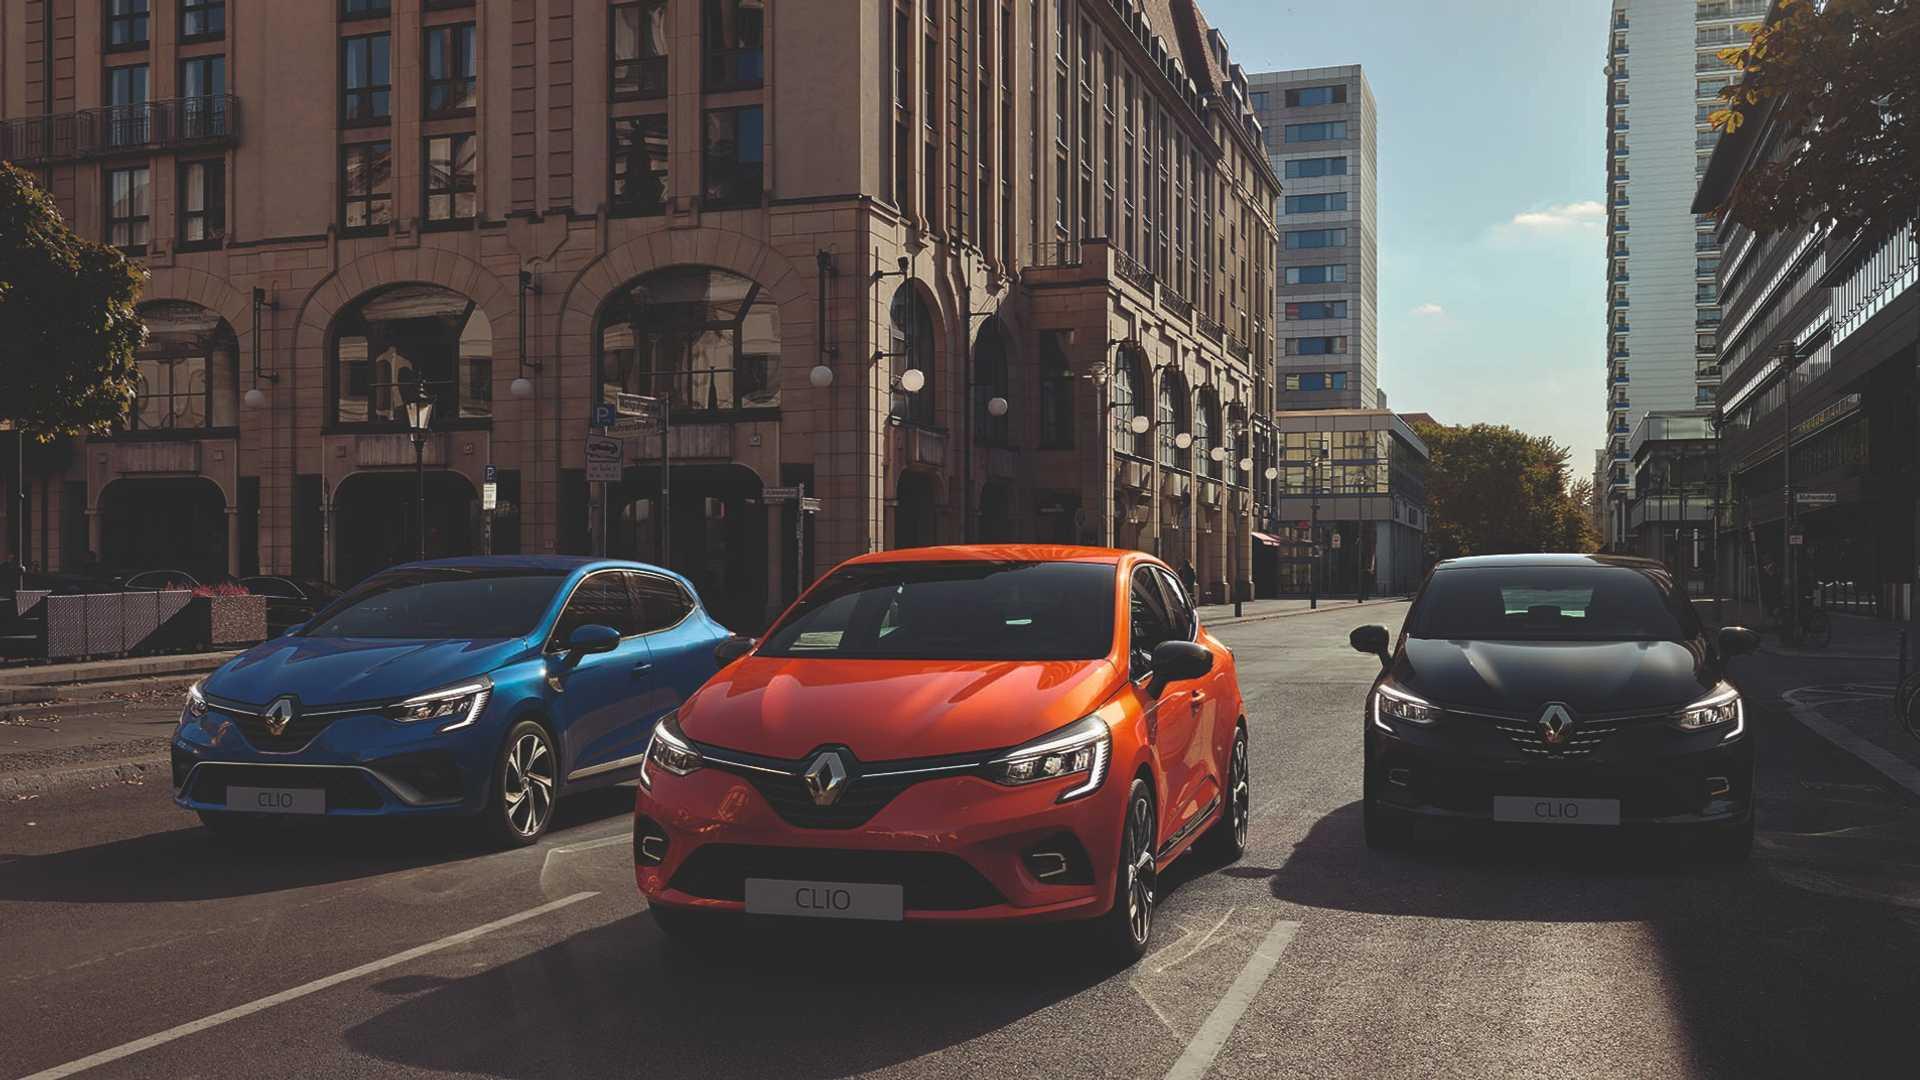 2019 Renault Clio V Revealed Ahead of Geneva Debut 13